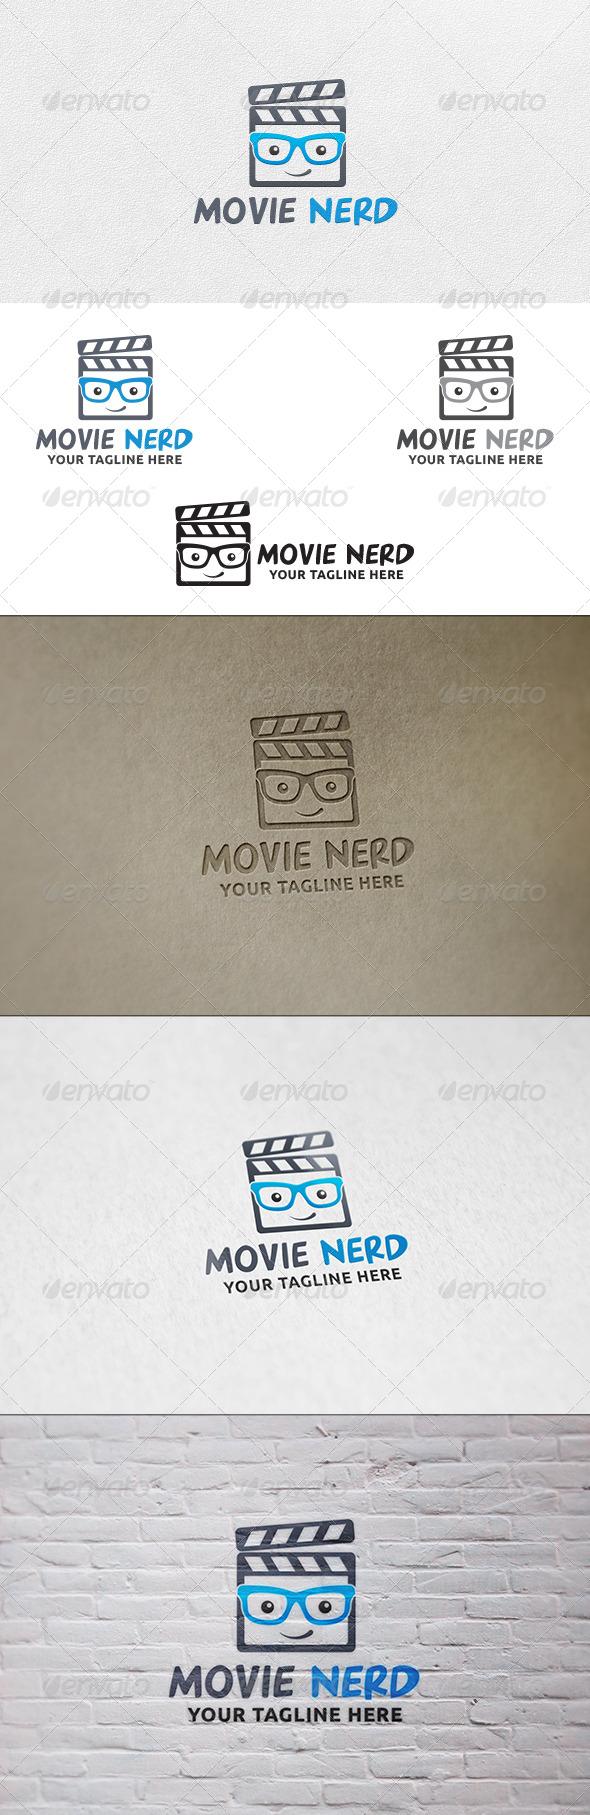 Movie Nerd - Logo Template